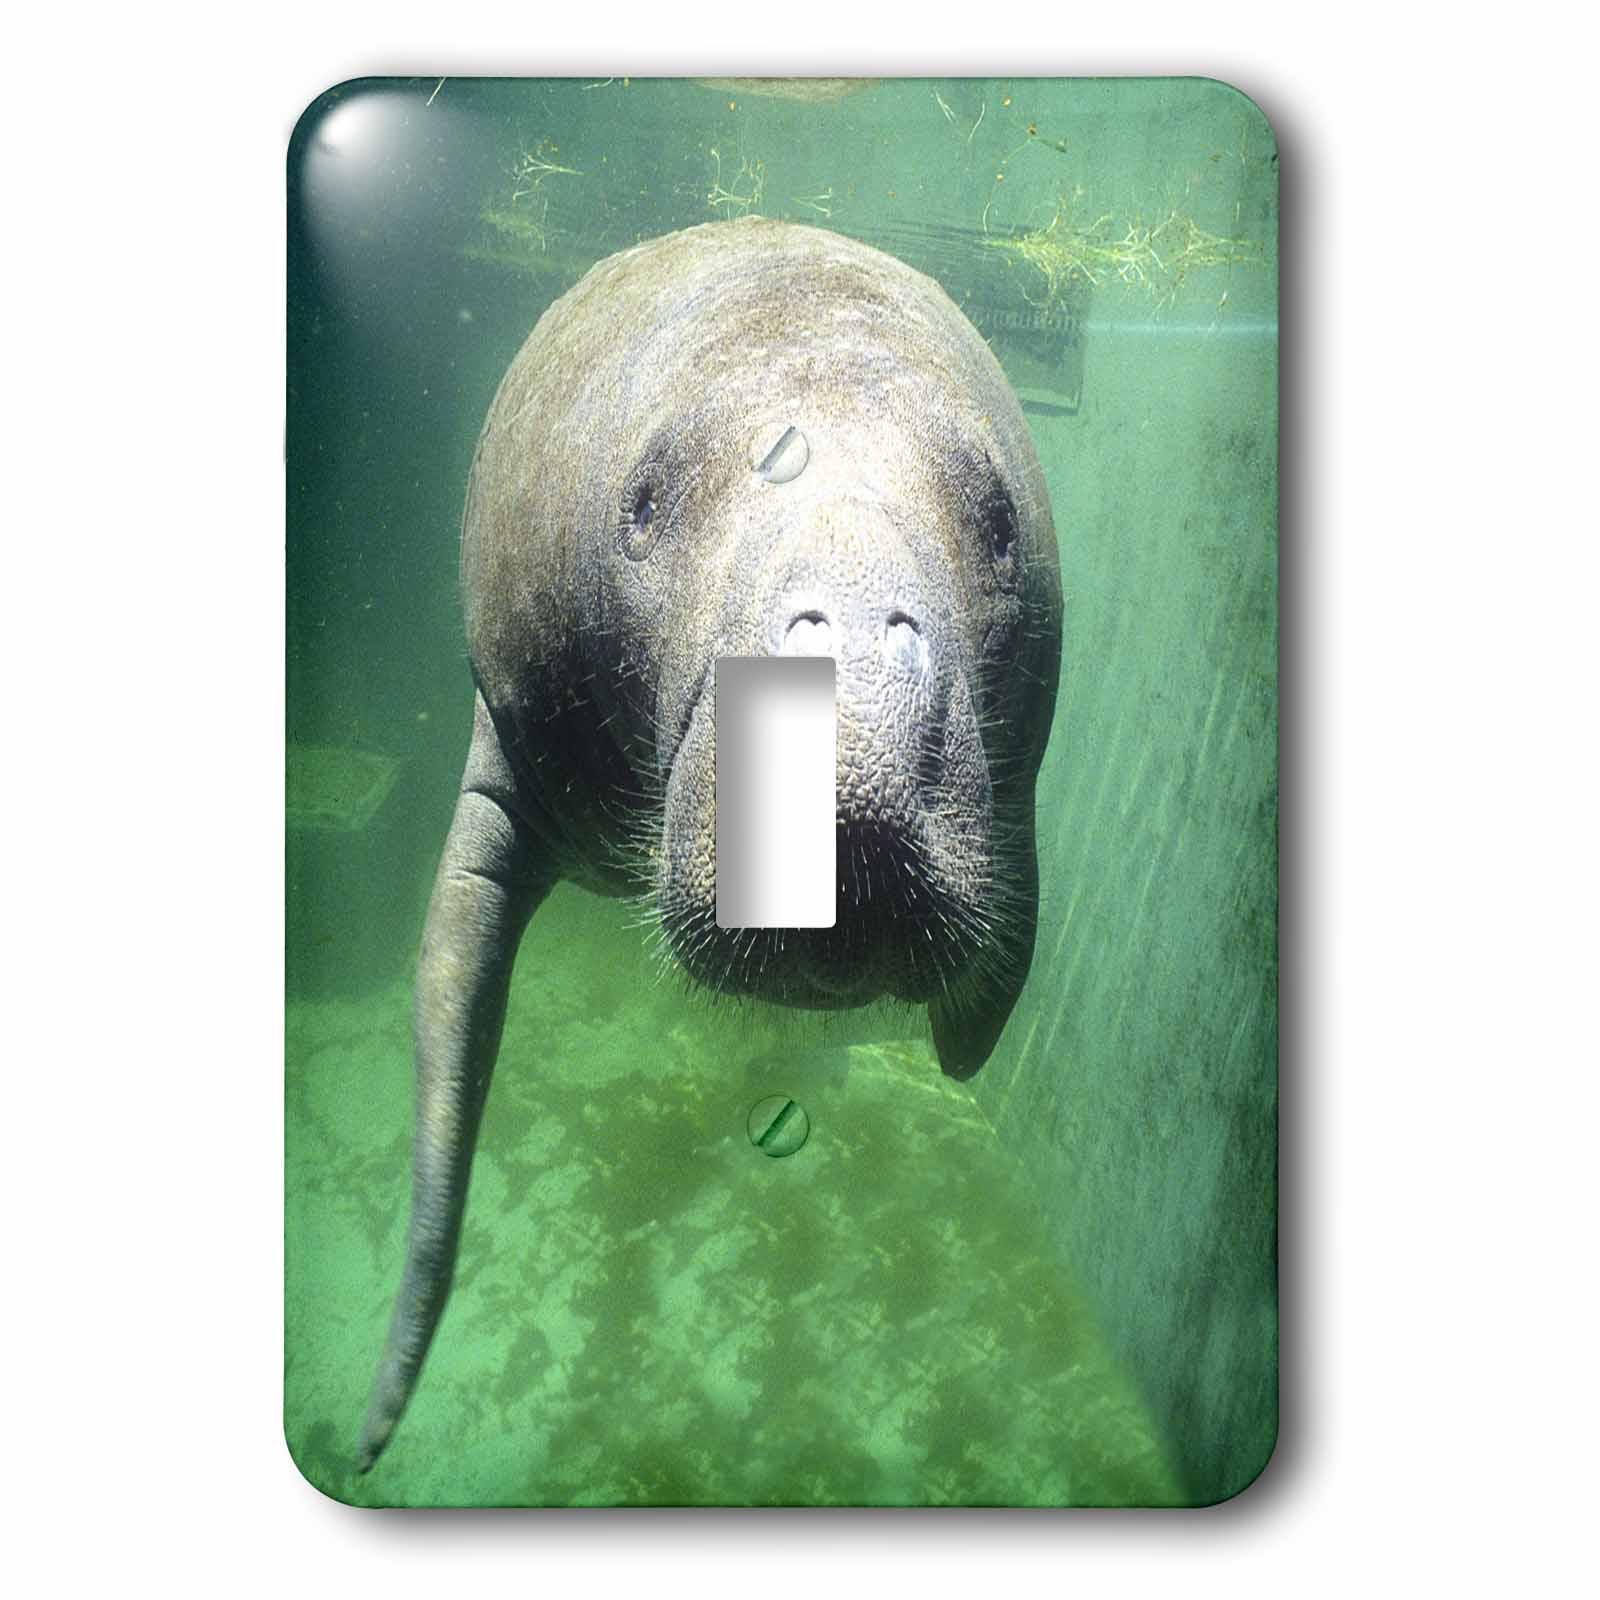 3dRose USA, Florida, Key West, Manatee - US10 GJO0382 - Greg Johnston, 2 Plug Outlet Cover